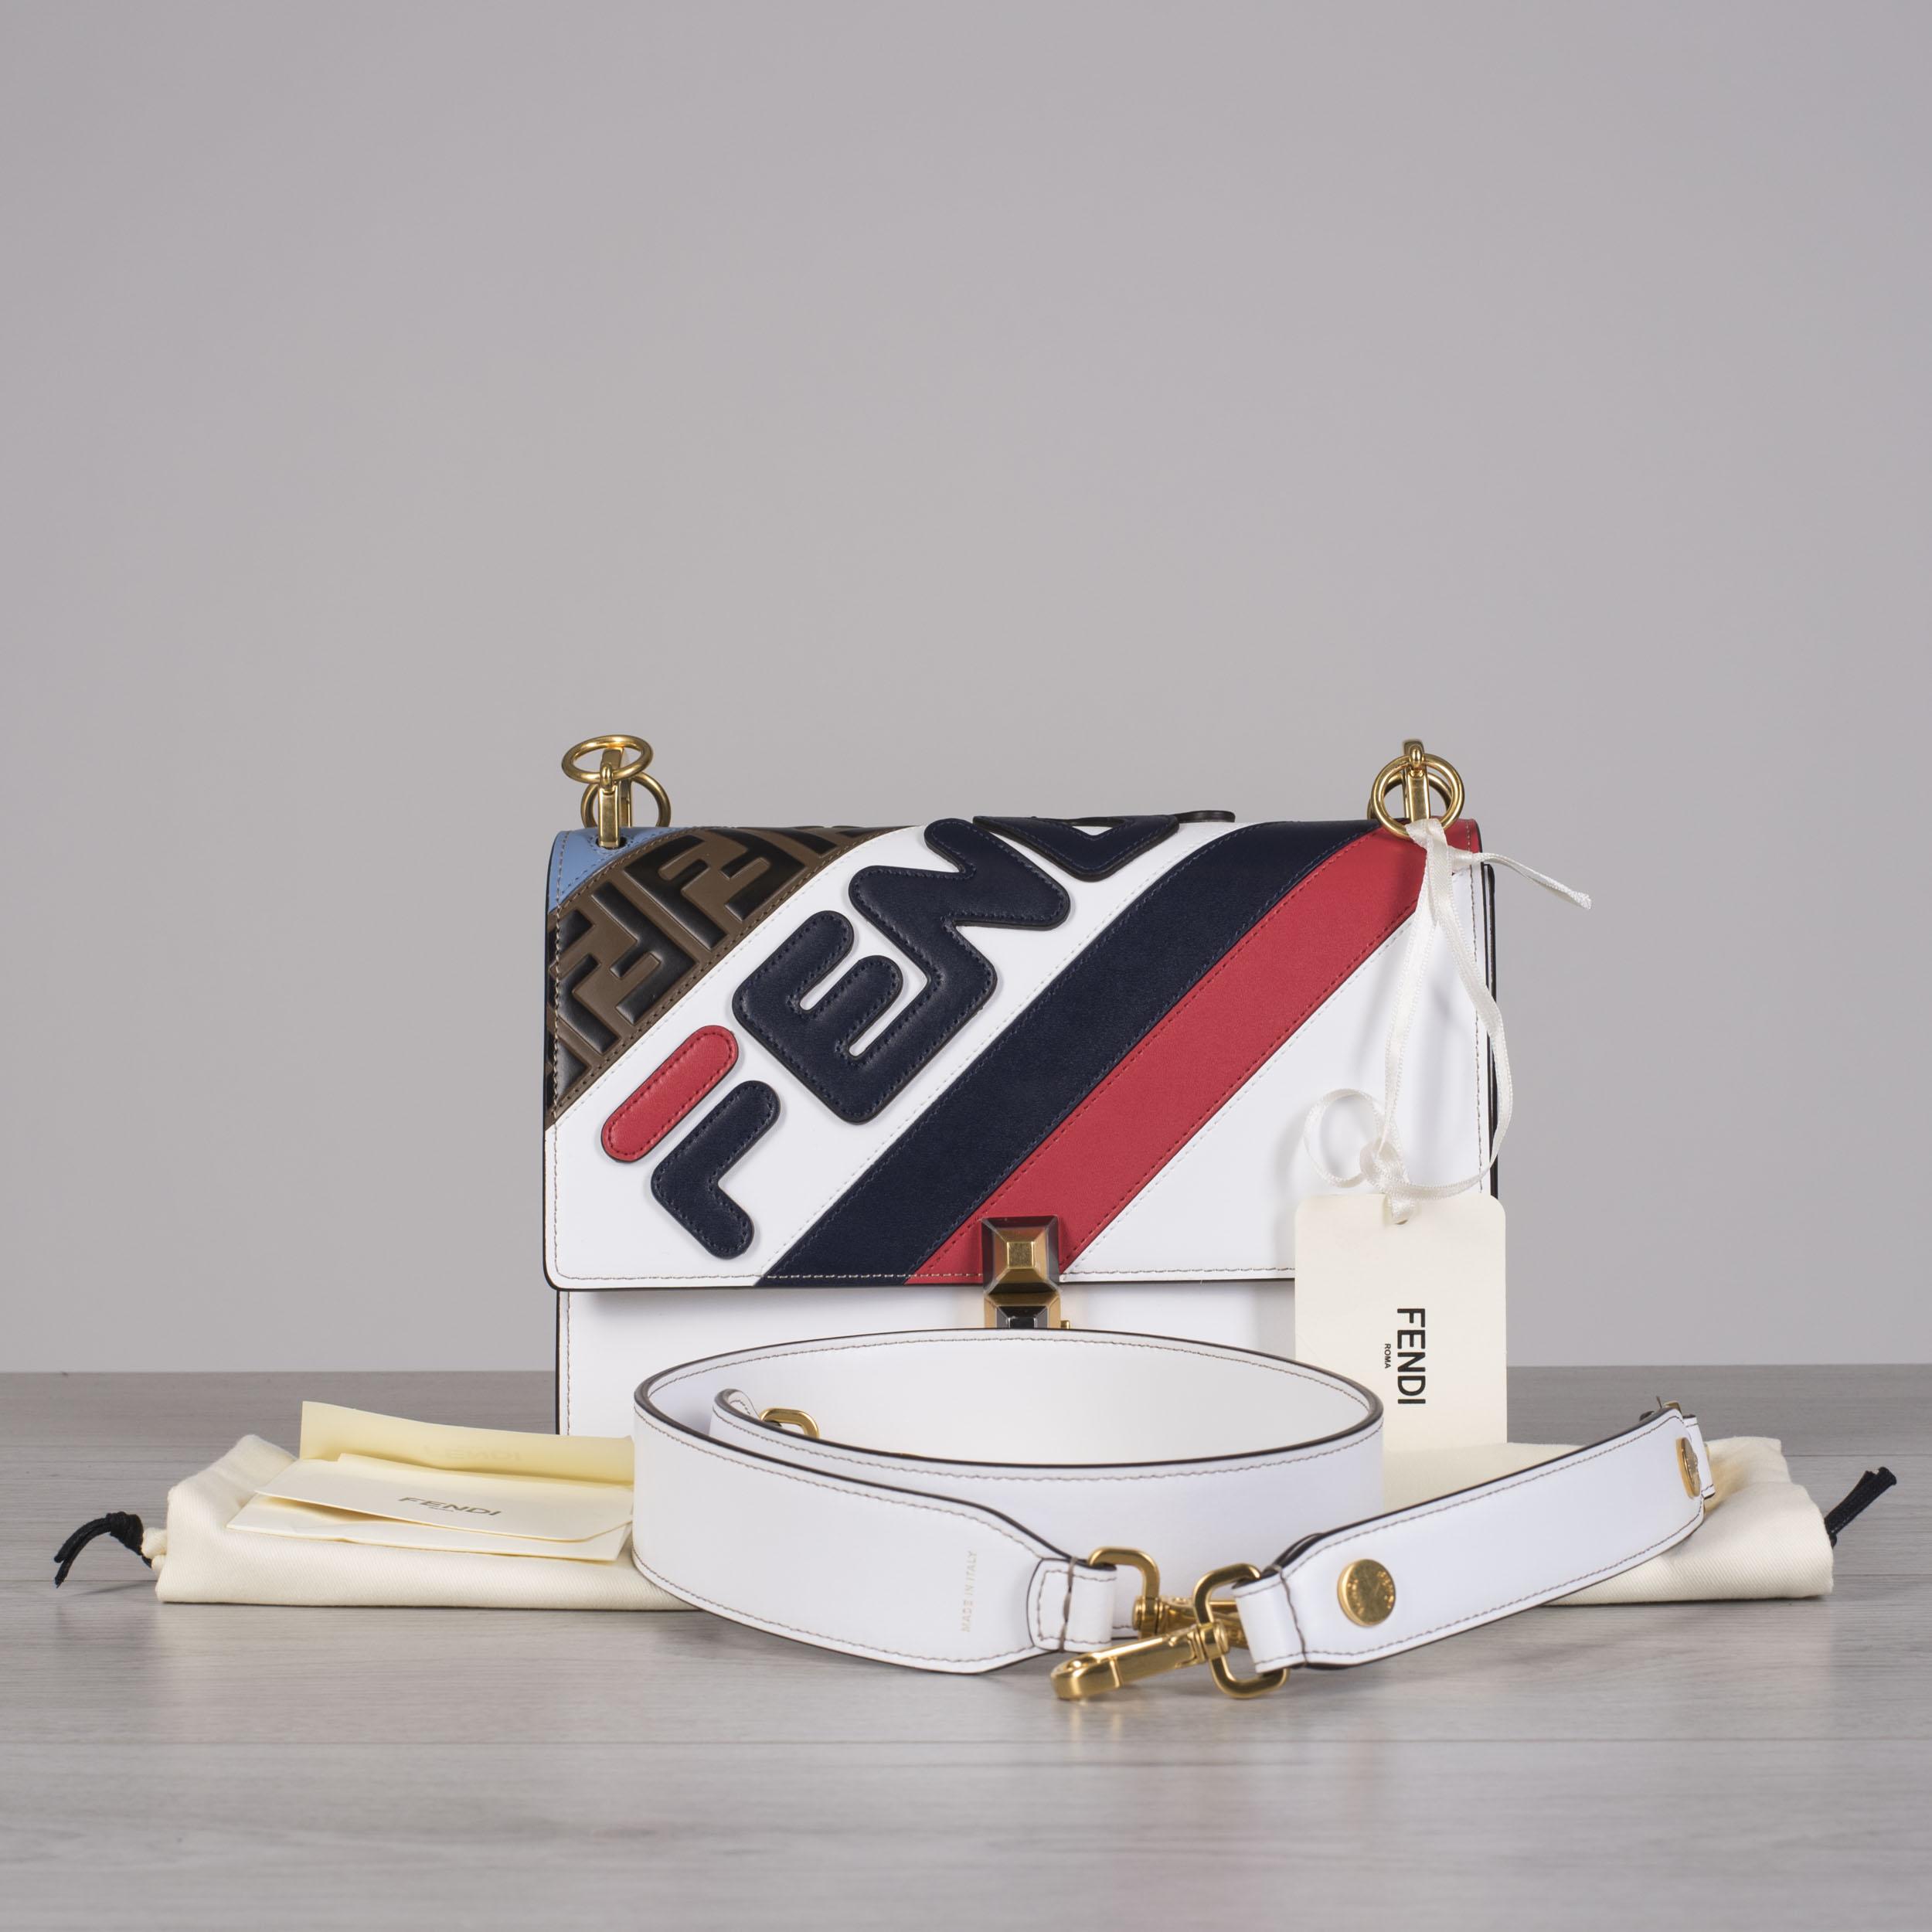 5db4a5f7ce66 Details about FENDI x FILA 2890  Multi Color Kan I Bag With Fendi Logo  Mania   FF Stripe